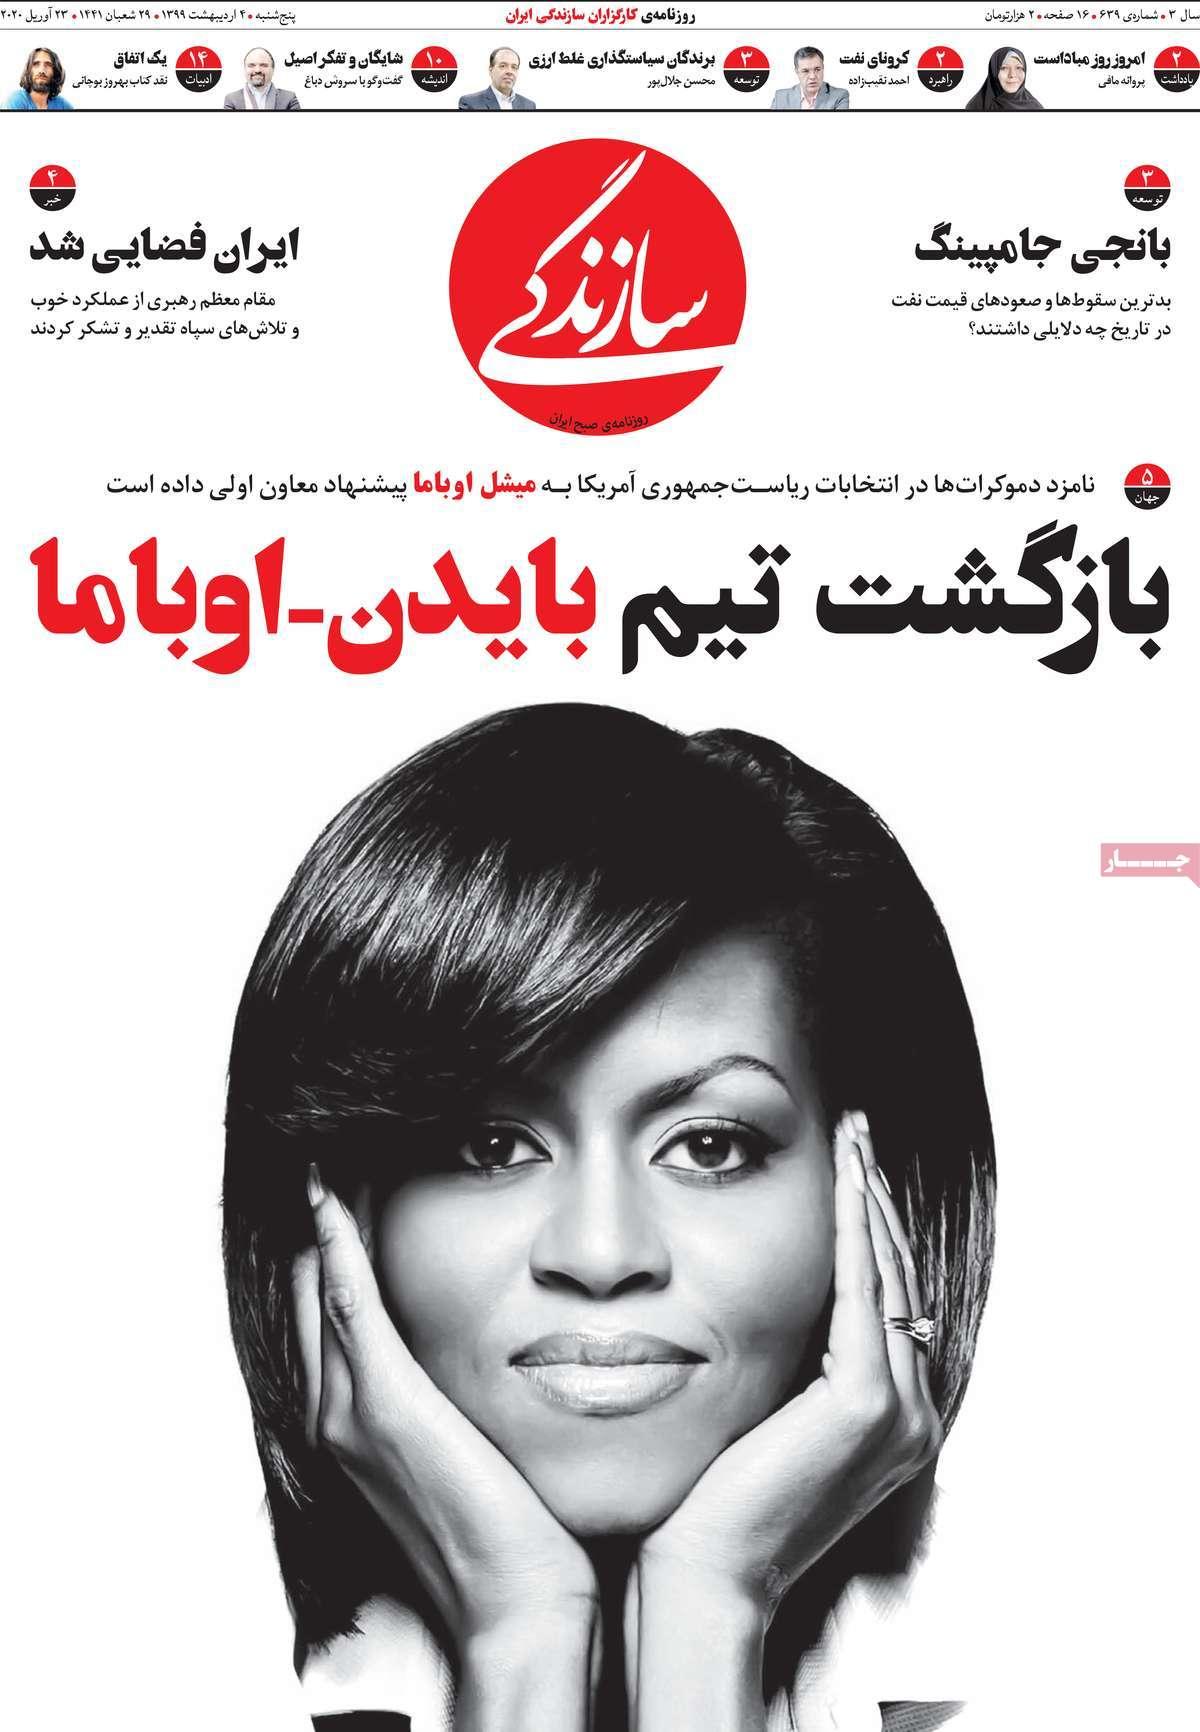 Sazandegi newspaper